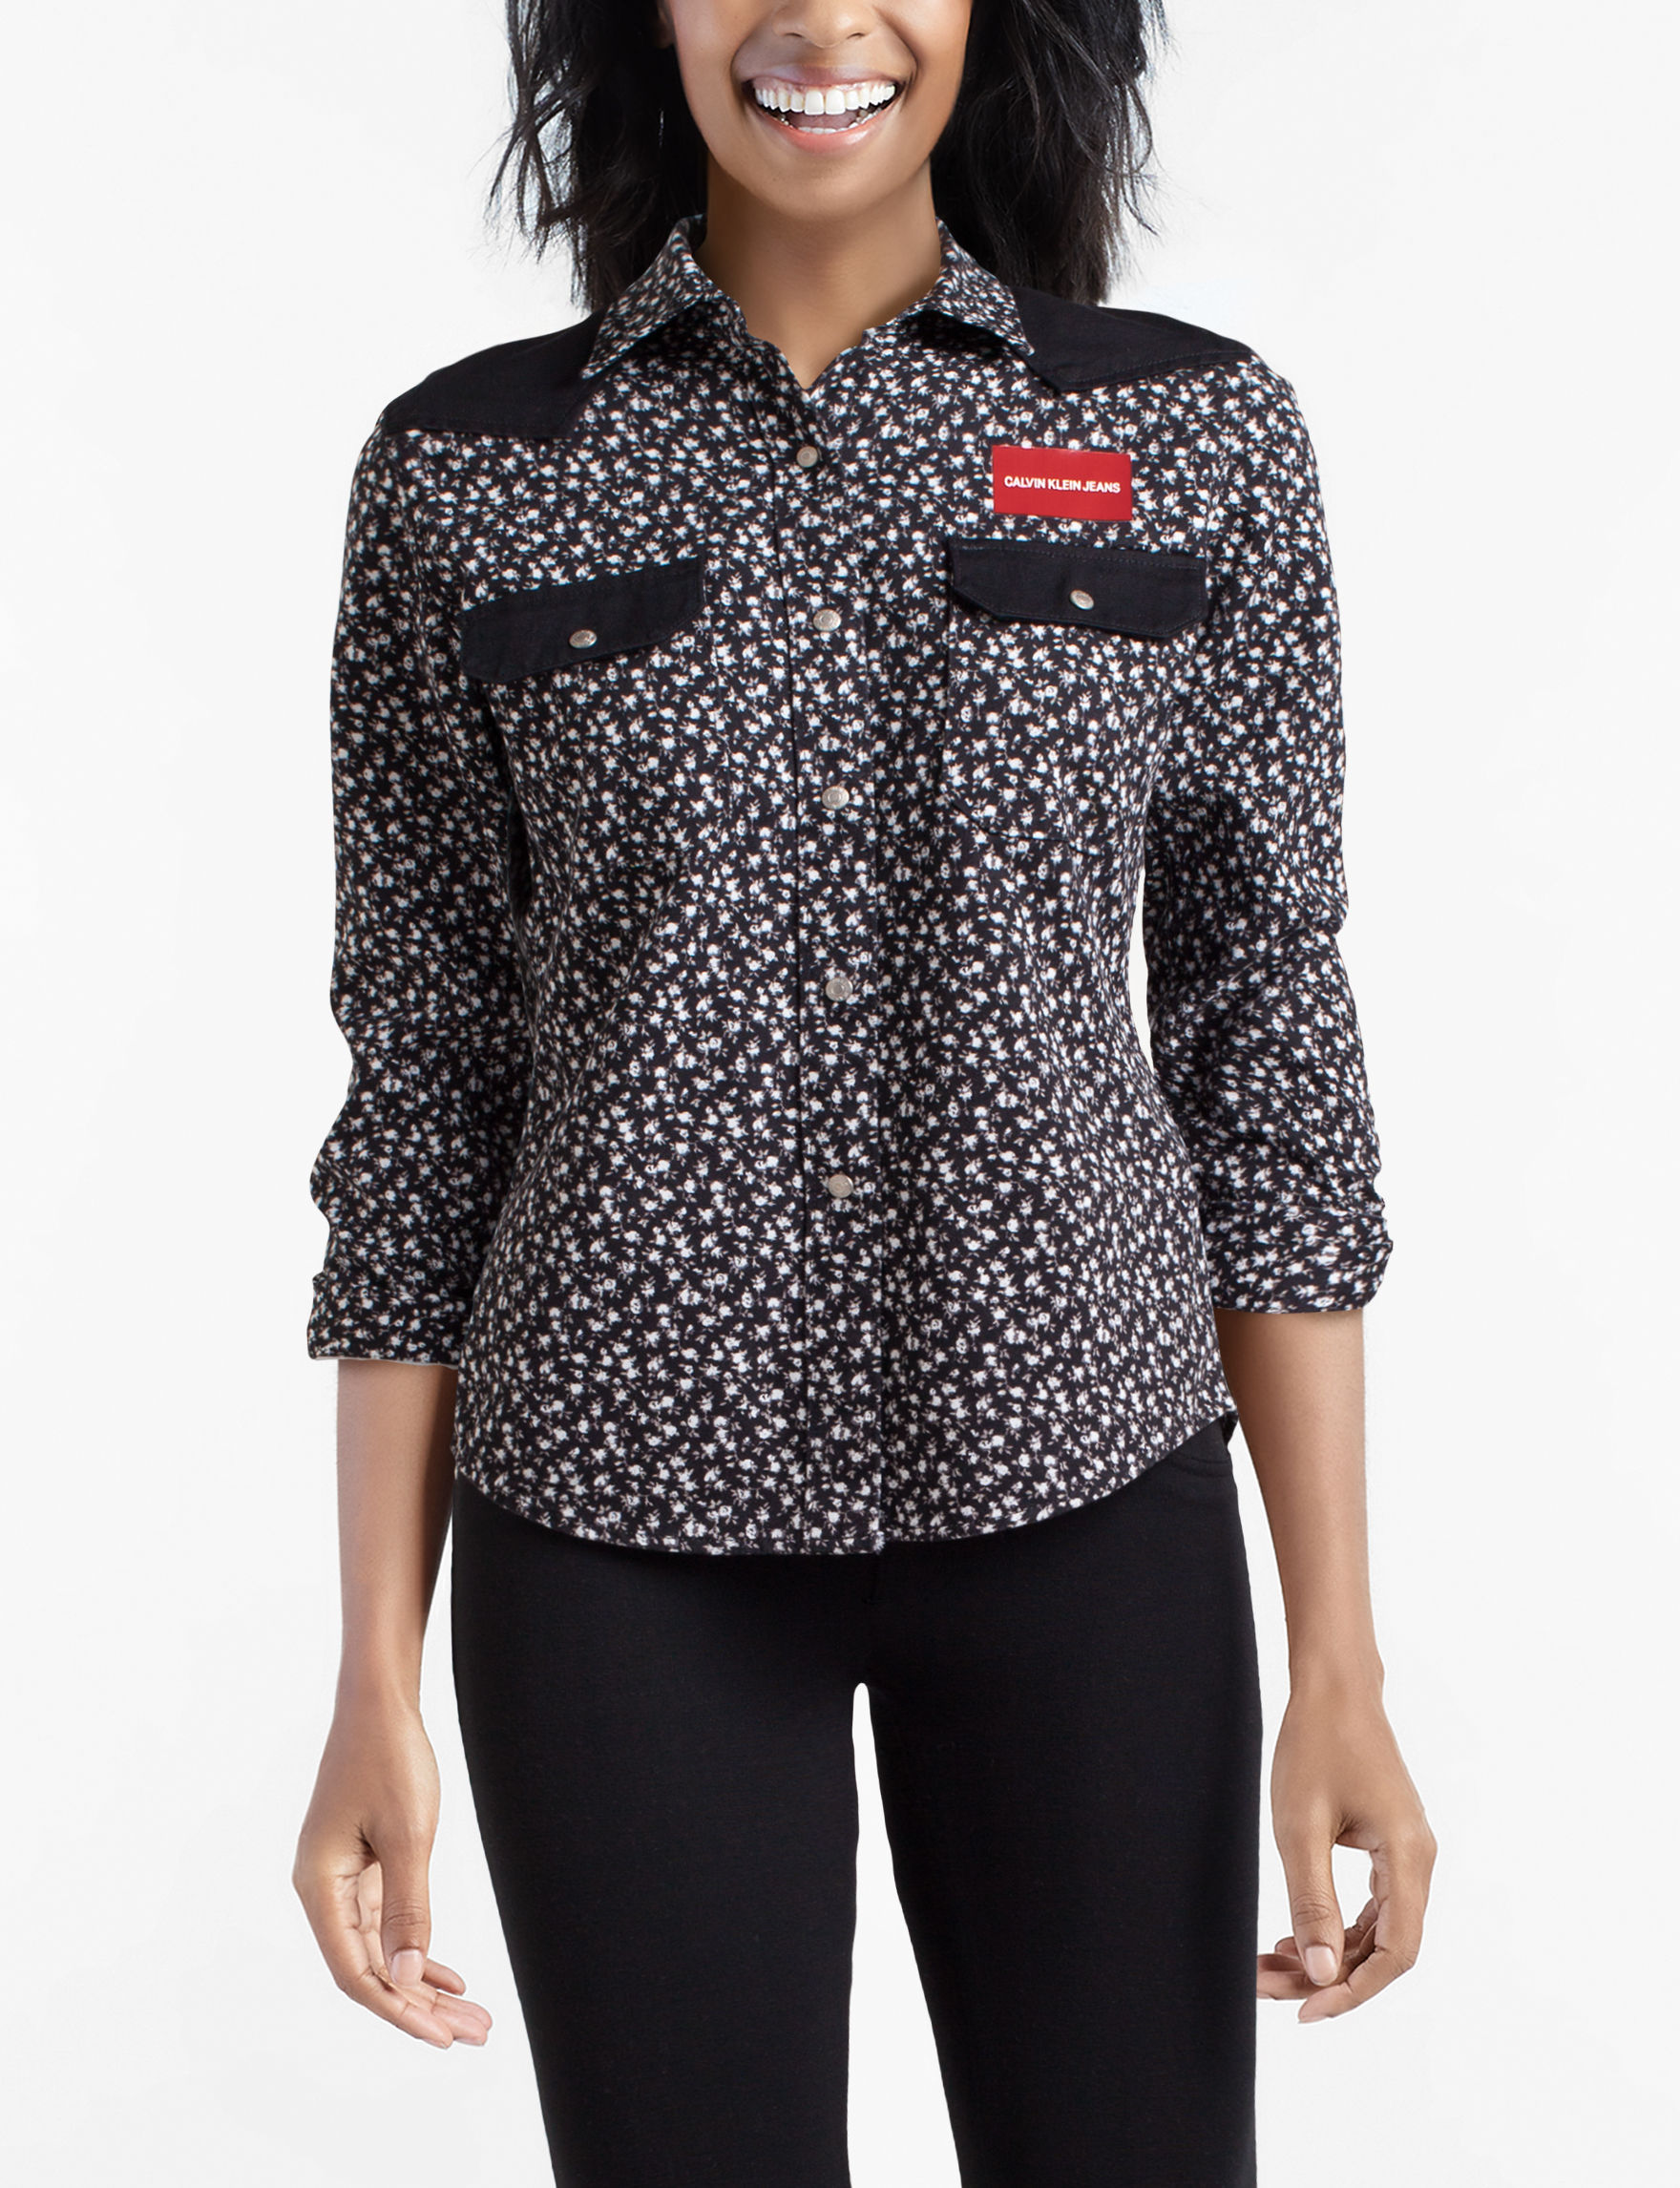 Calvin Klein Jeans Black White Shirts & Blouses